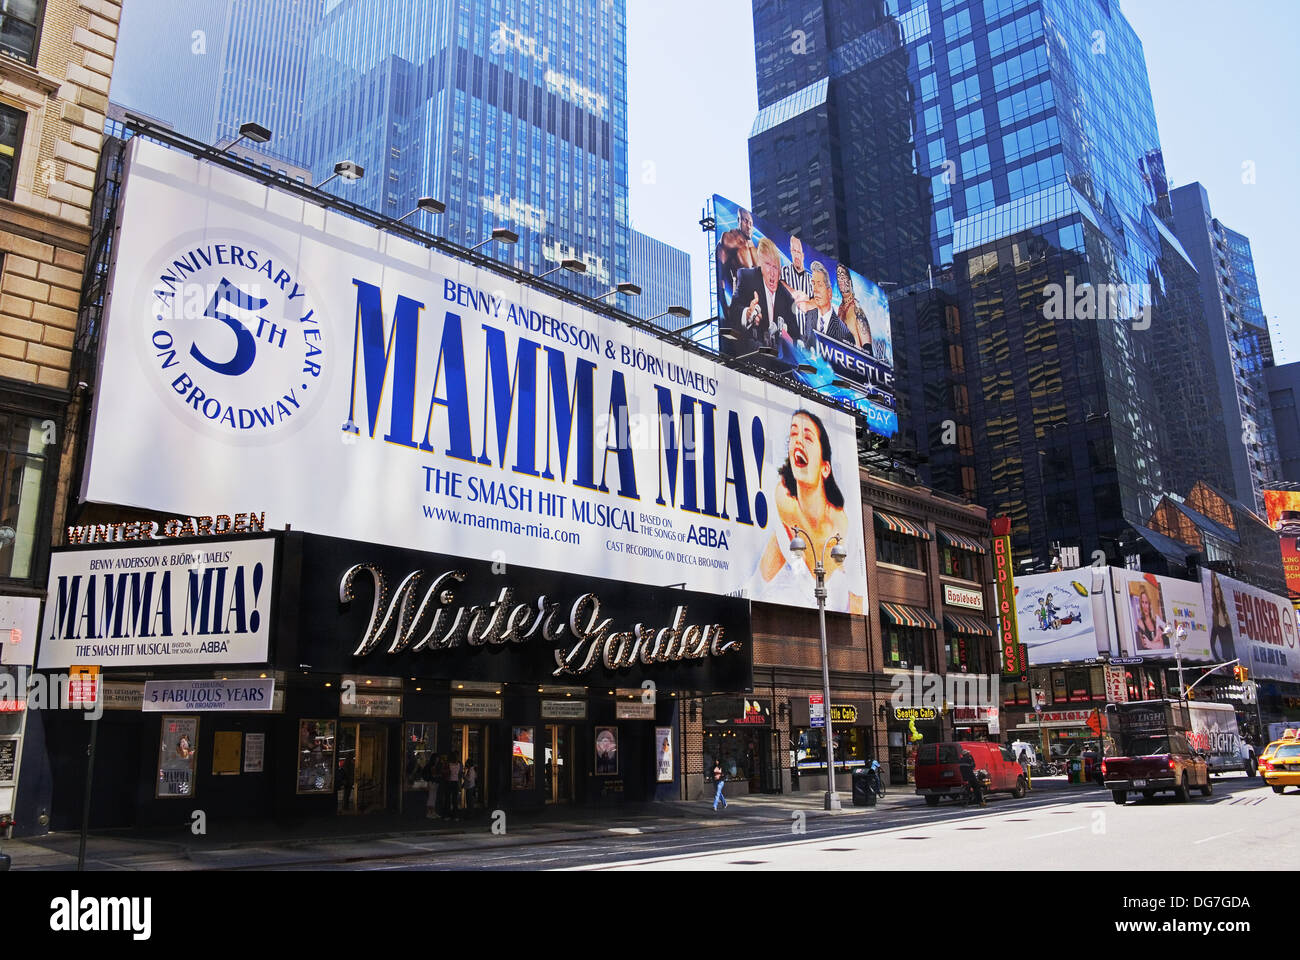 Winter Garden Theater Broadway Times Square Manhattan New York Stock Photo Royalty Free